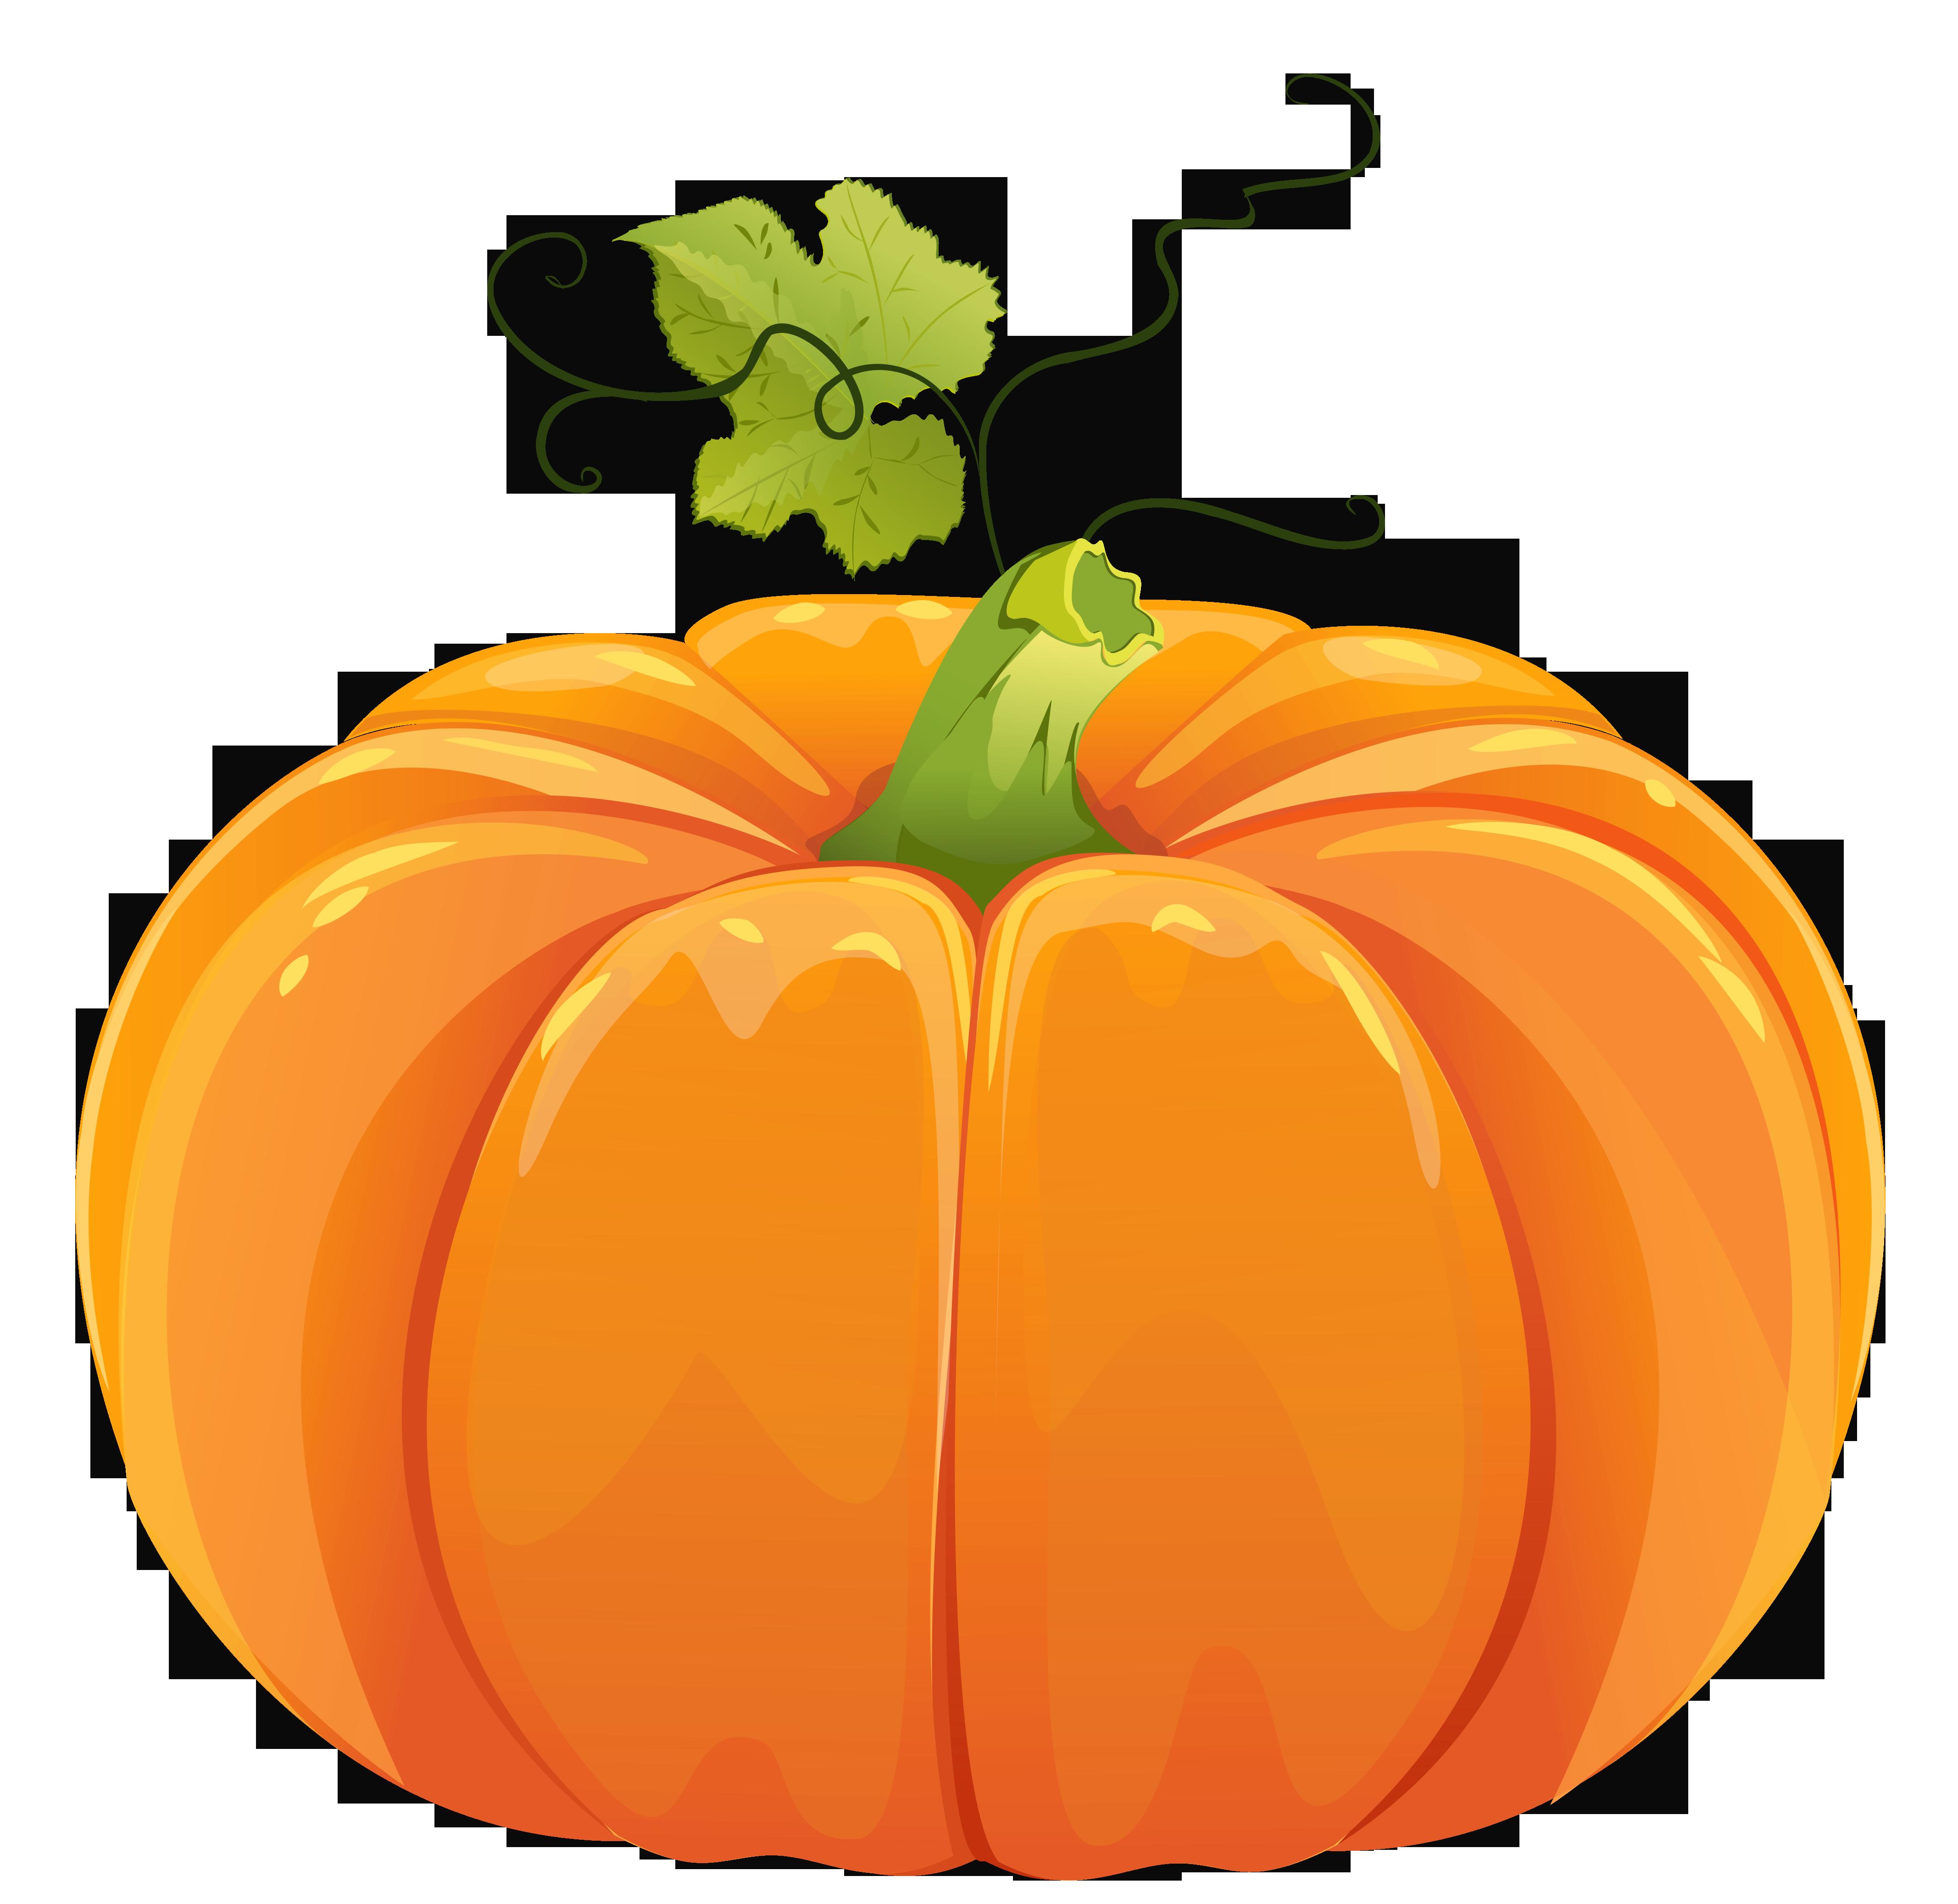 fall pumpkin clipart at getdrawings com free for personal use fall rh getdrawings com pumpkin clip art free silhouette pumpkin pie clipart free